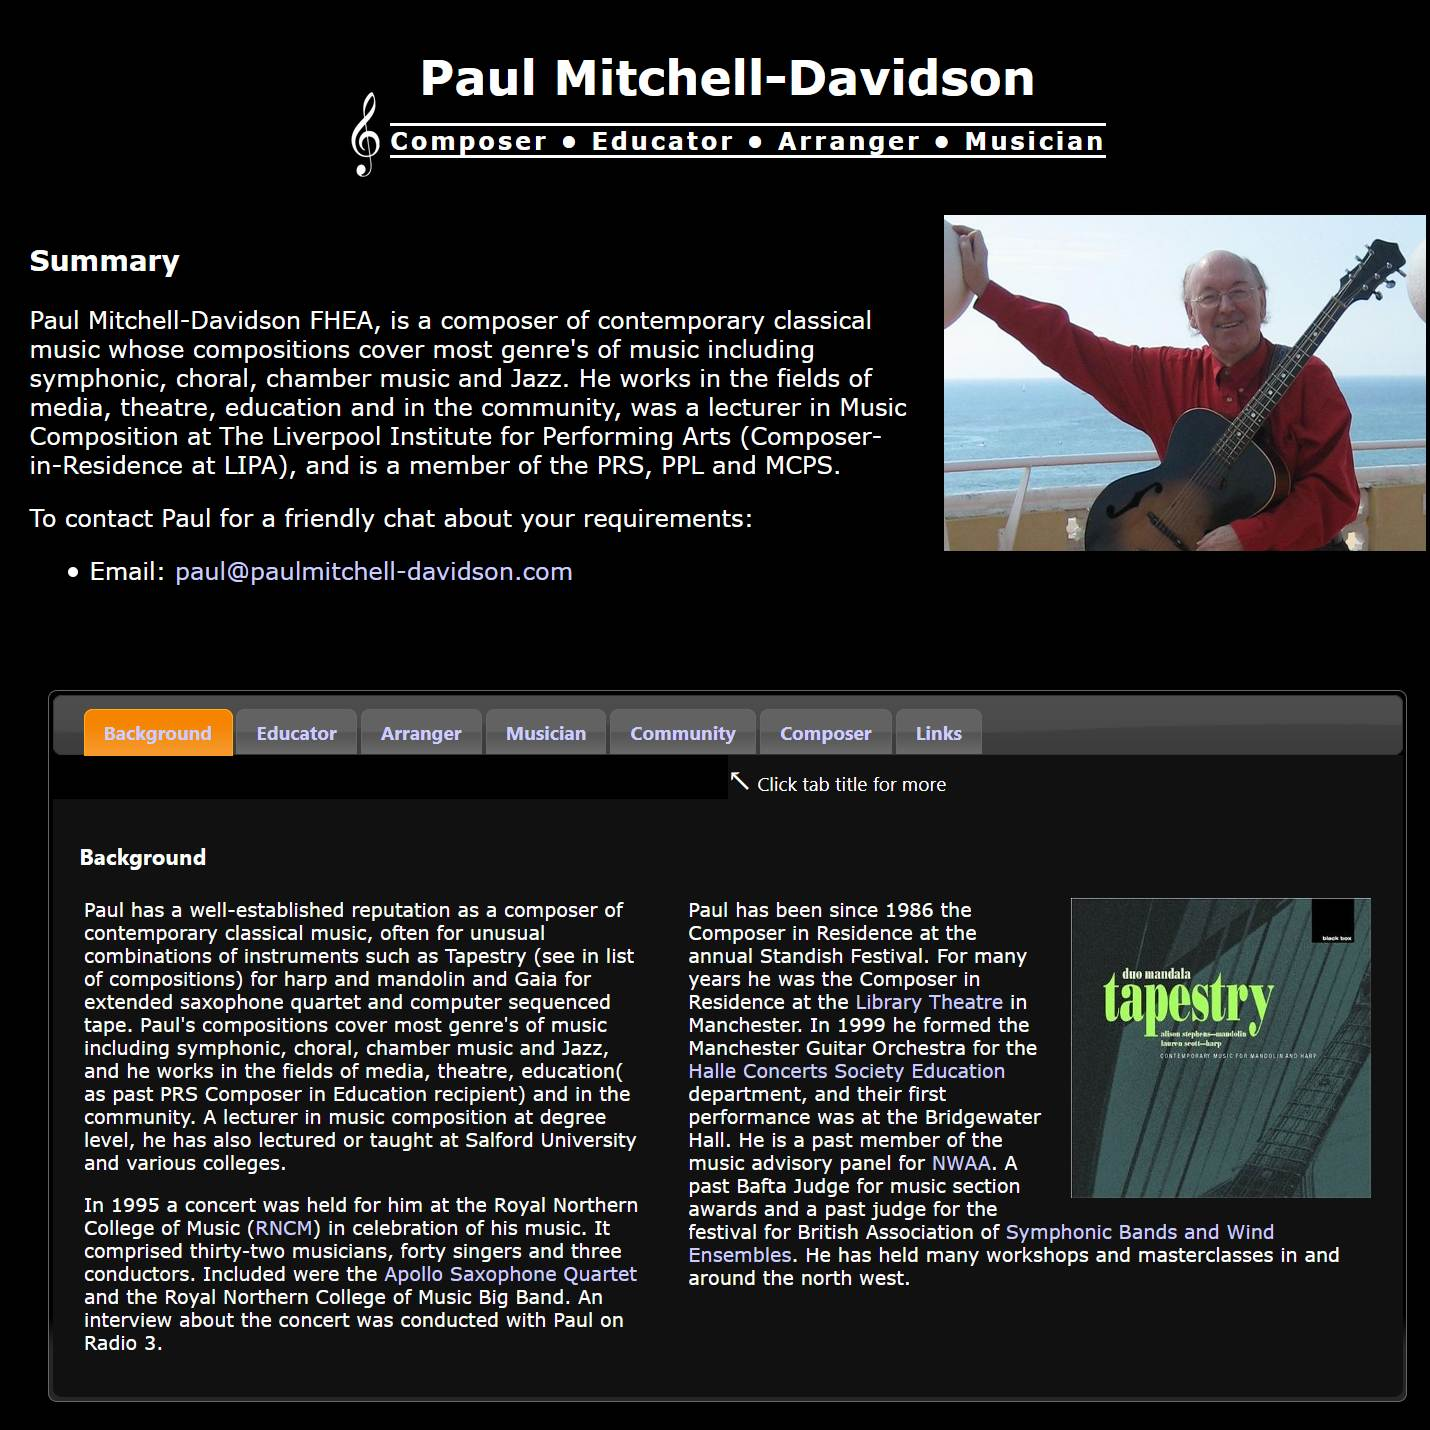 Paul Mitchell-Davidson website